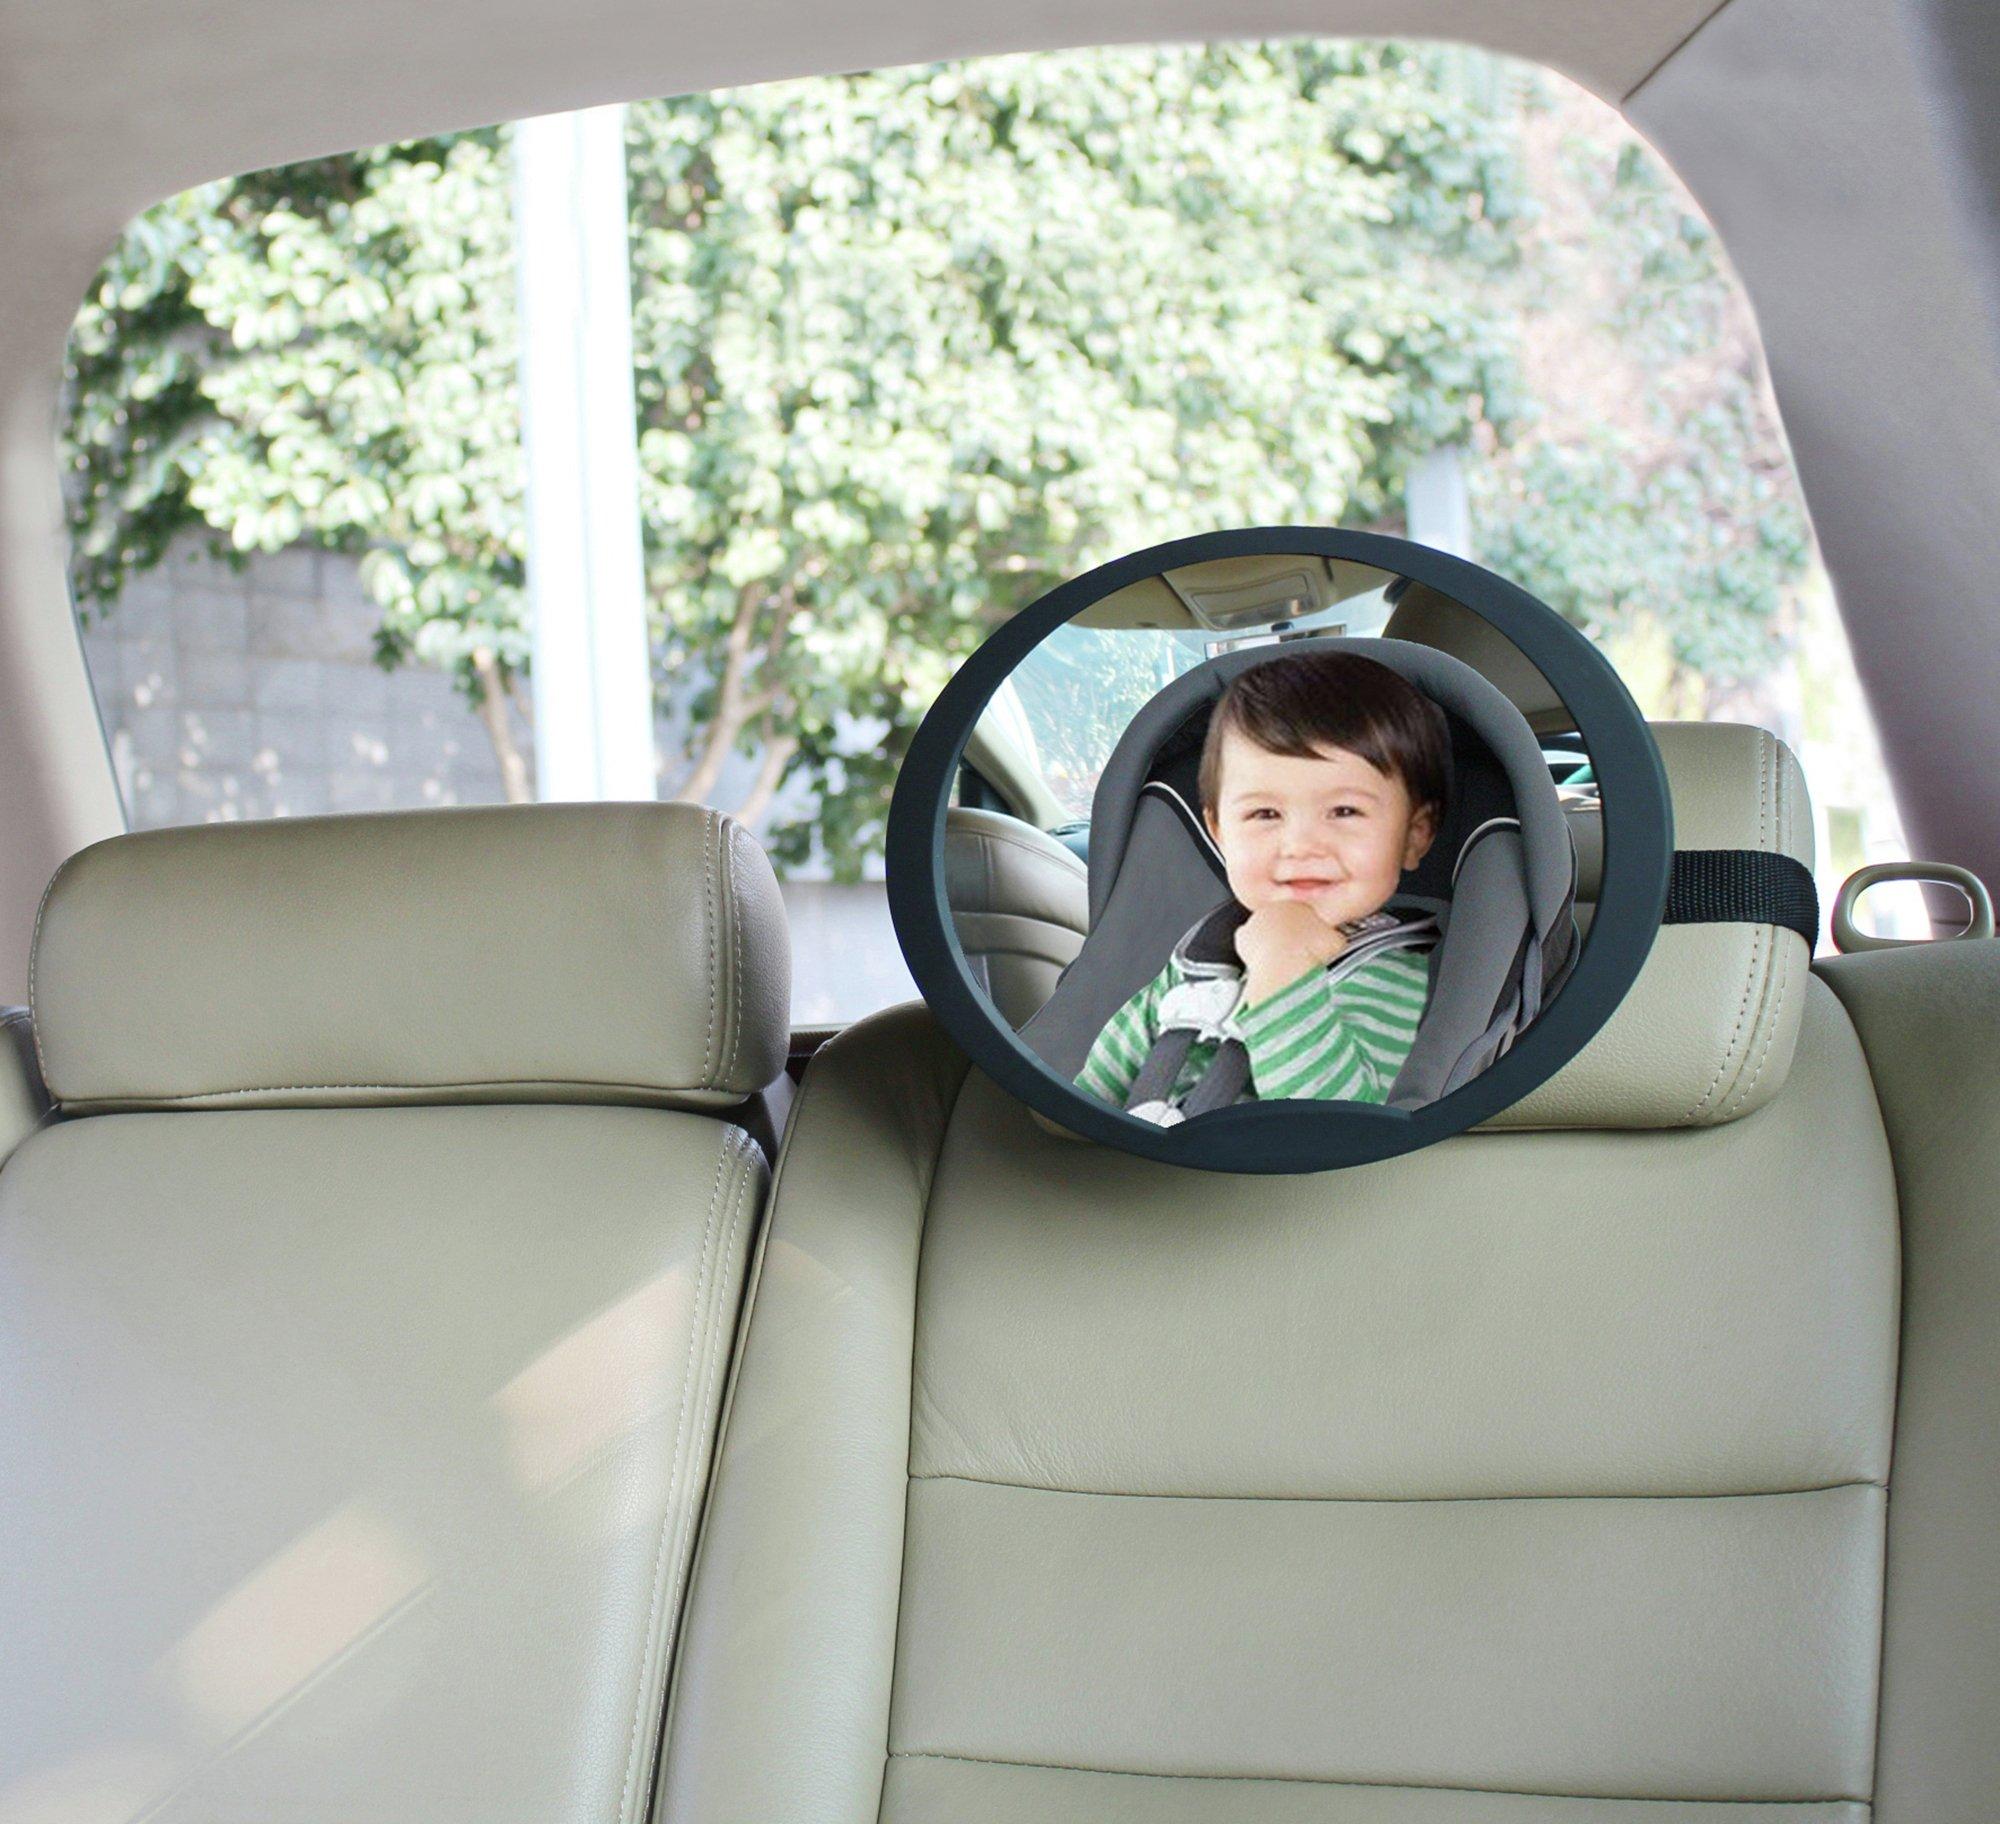 BabyDan Adjustable Rear Seat Large Wide Angled Mirror